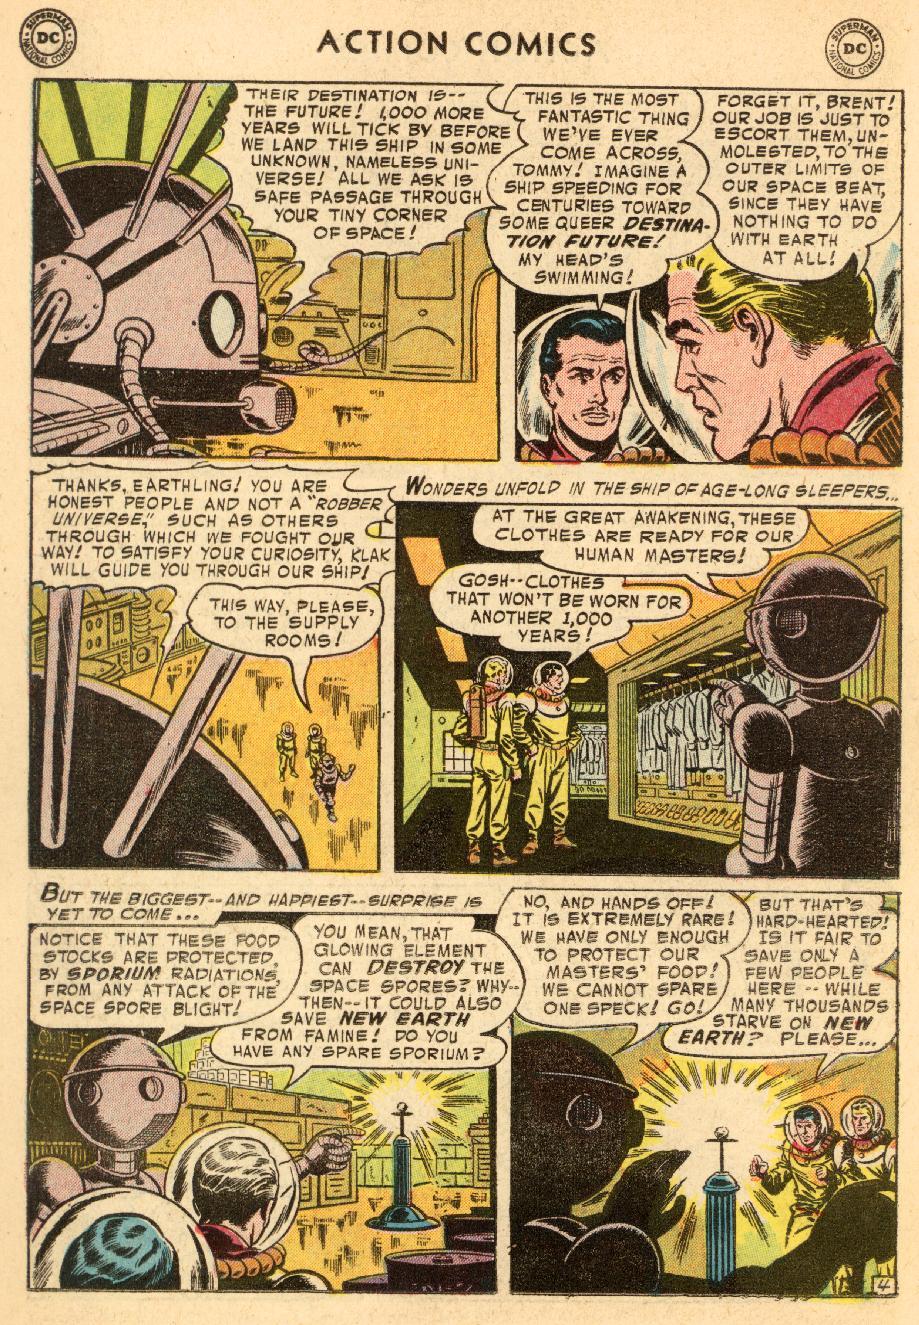 Action Comics (1938) 206 Page 19